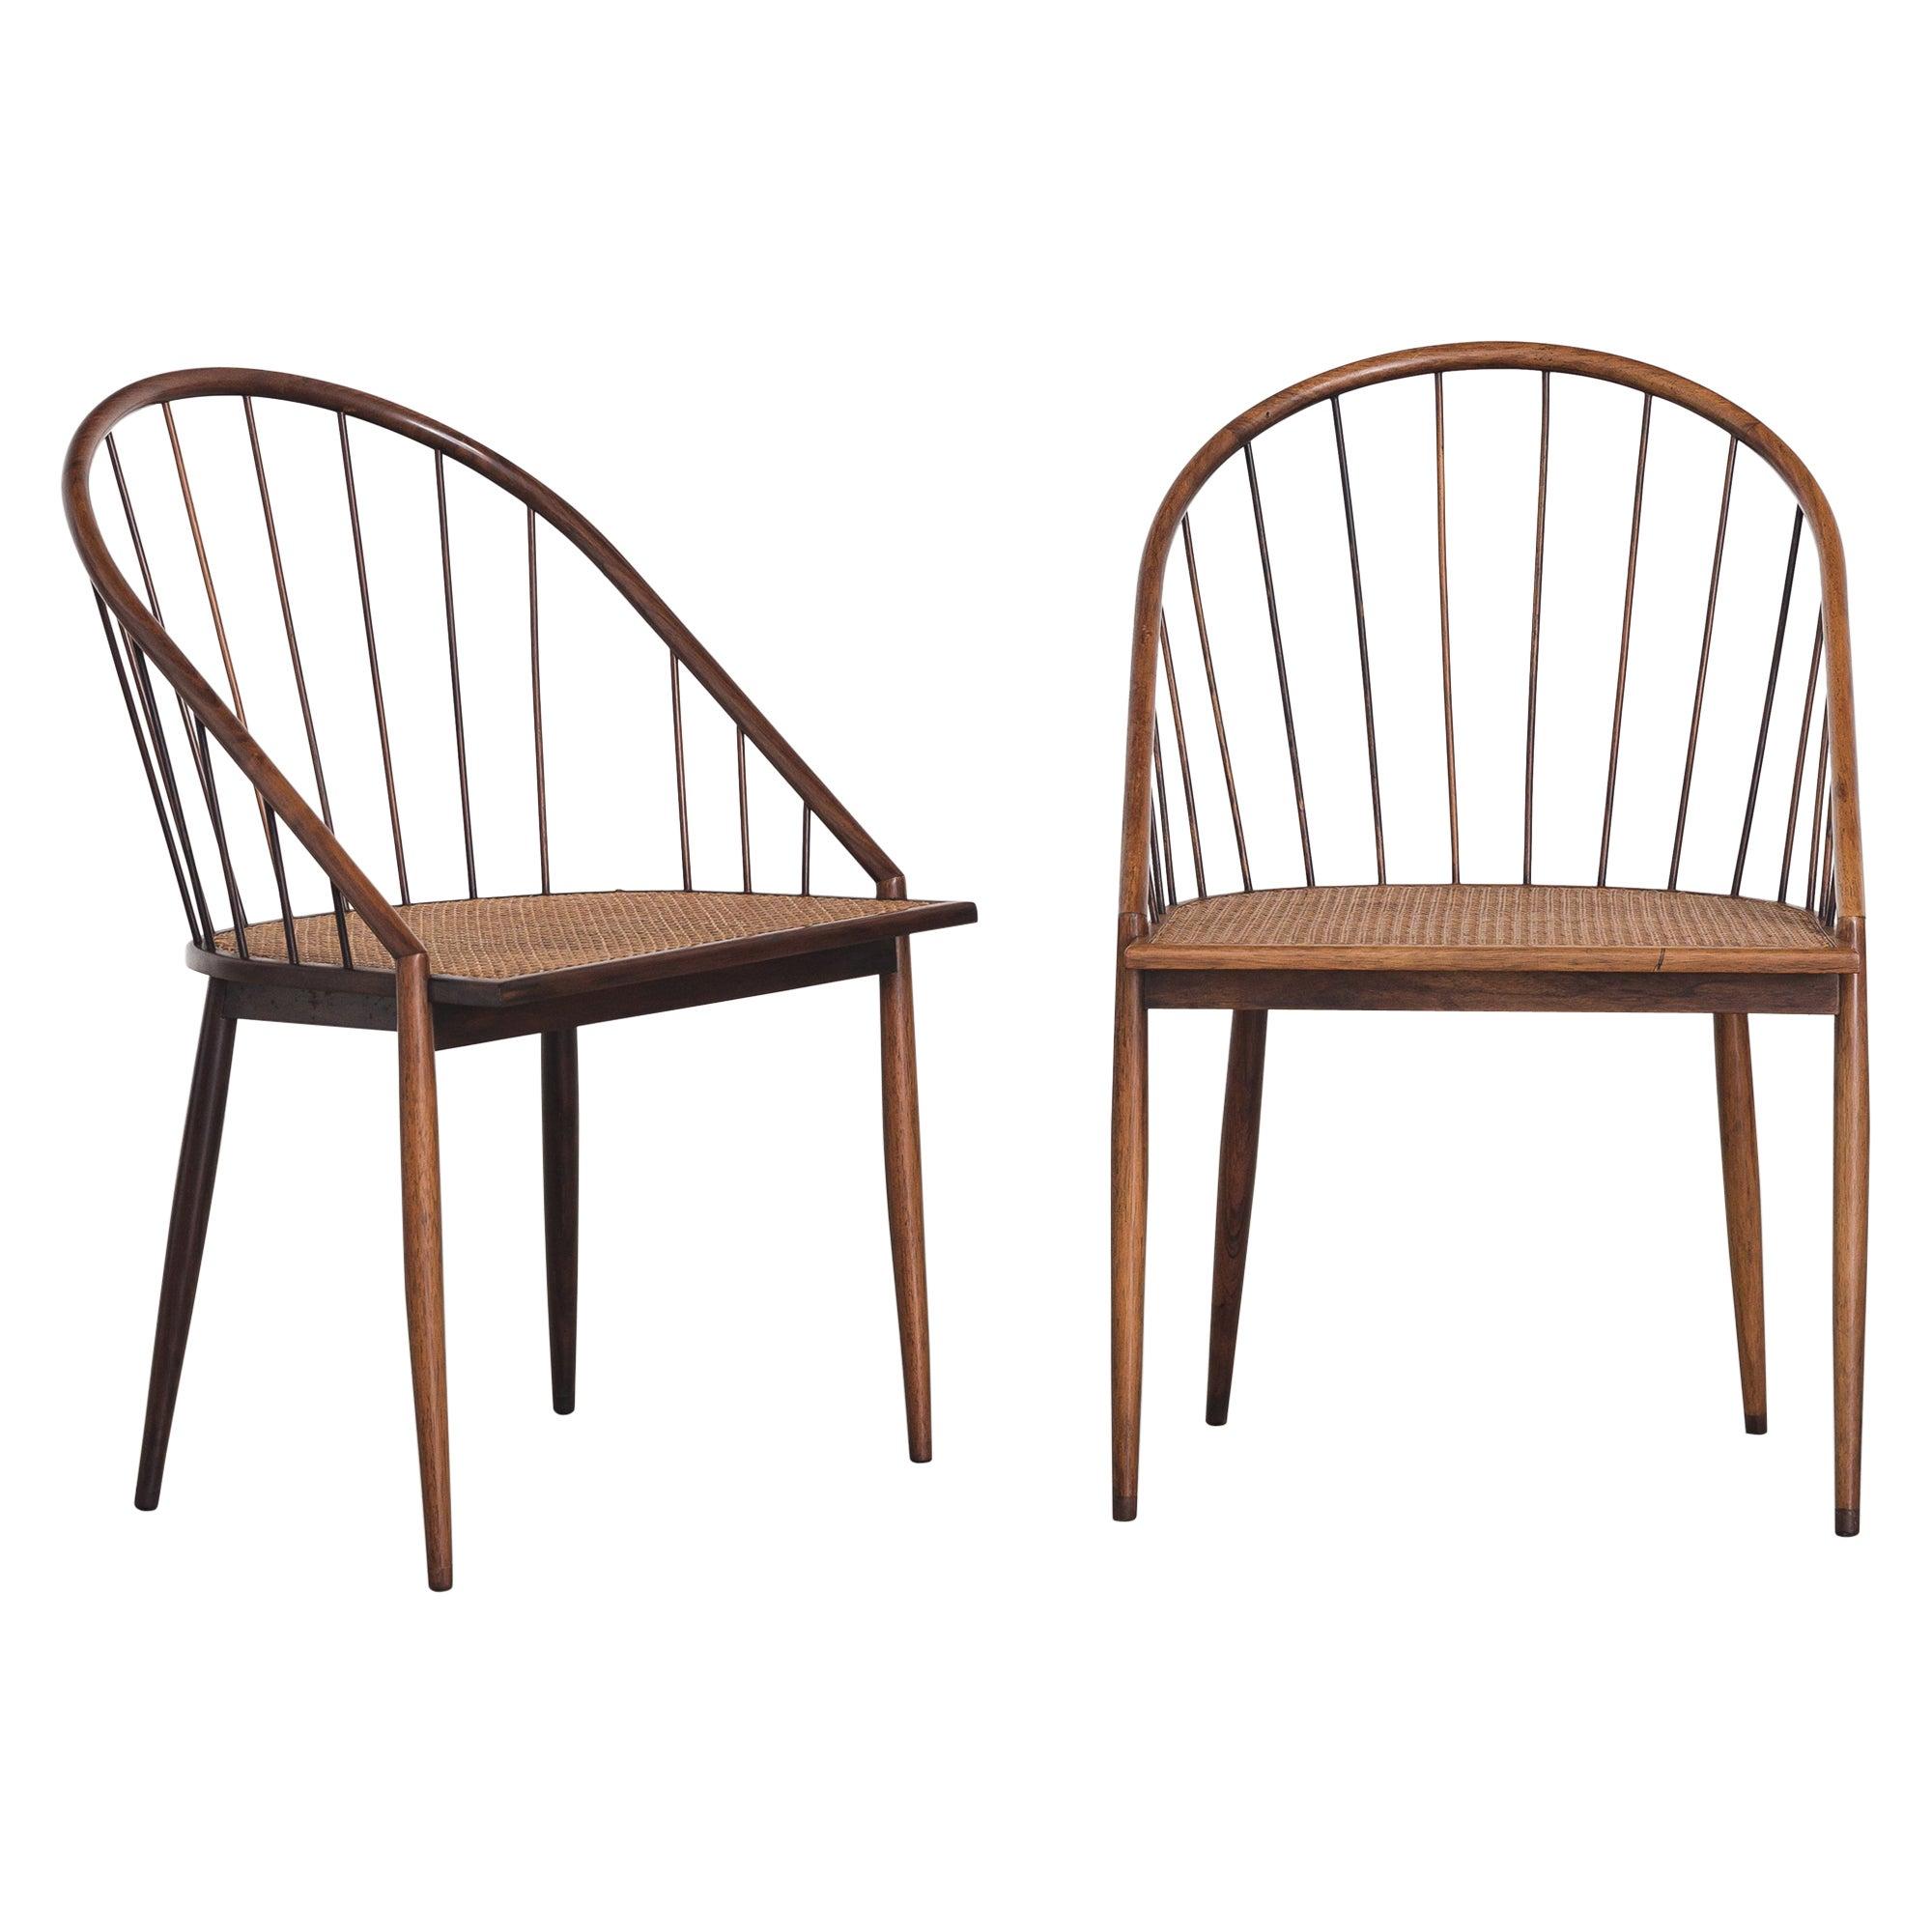 Curva Chair by Joaquim Tenreiro, 1960s, Brazilian Midcentury Design